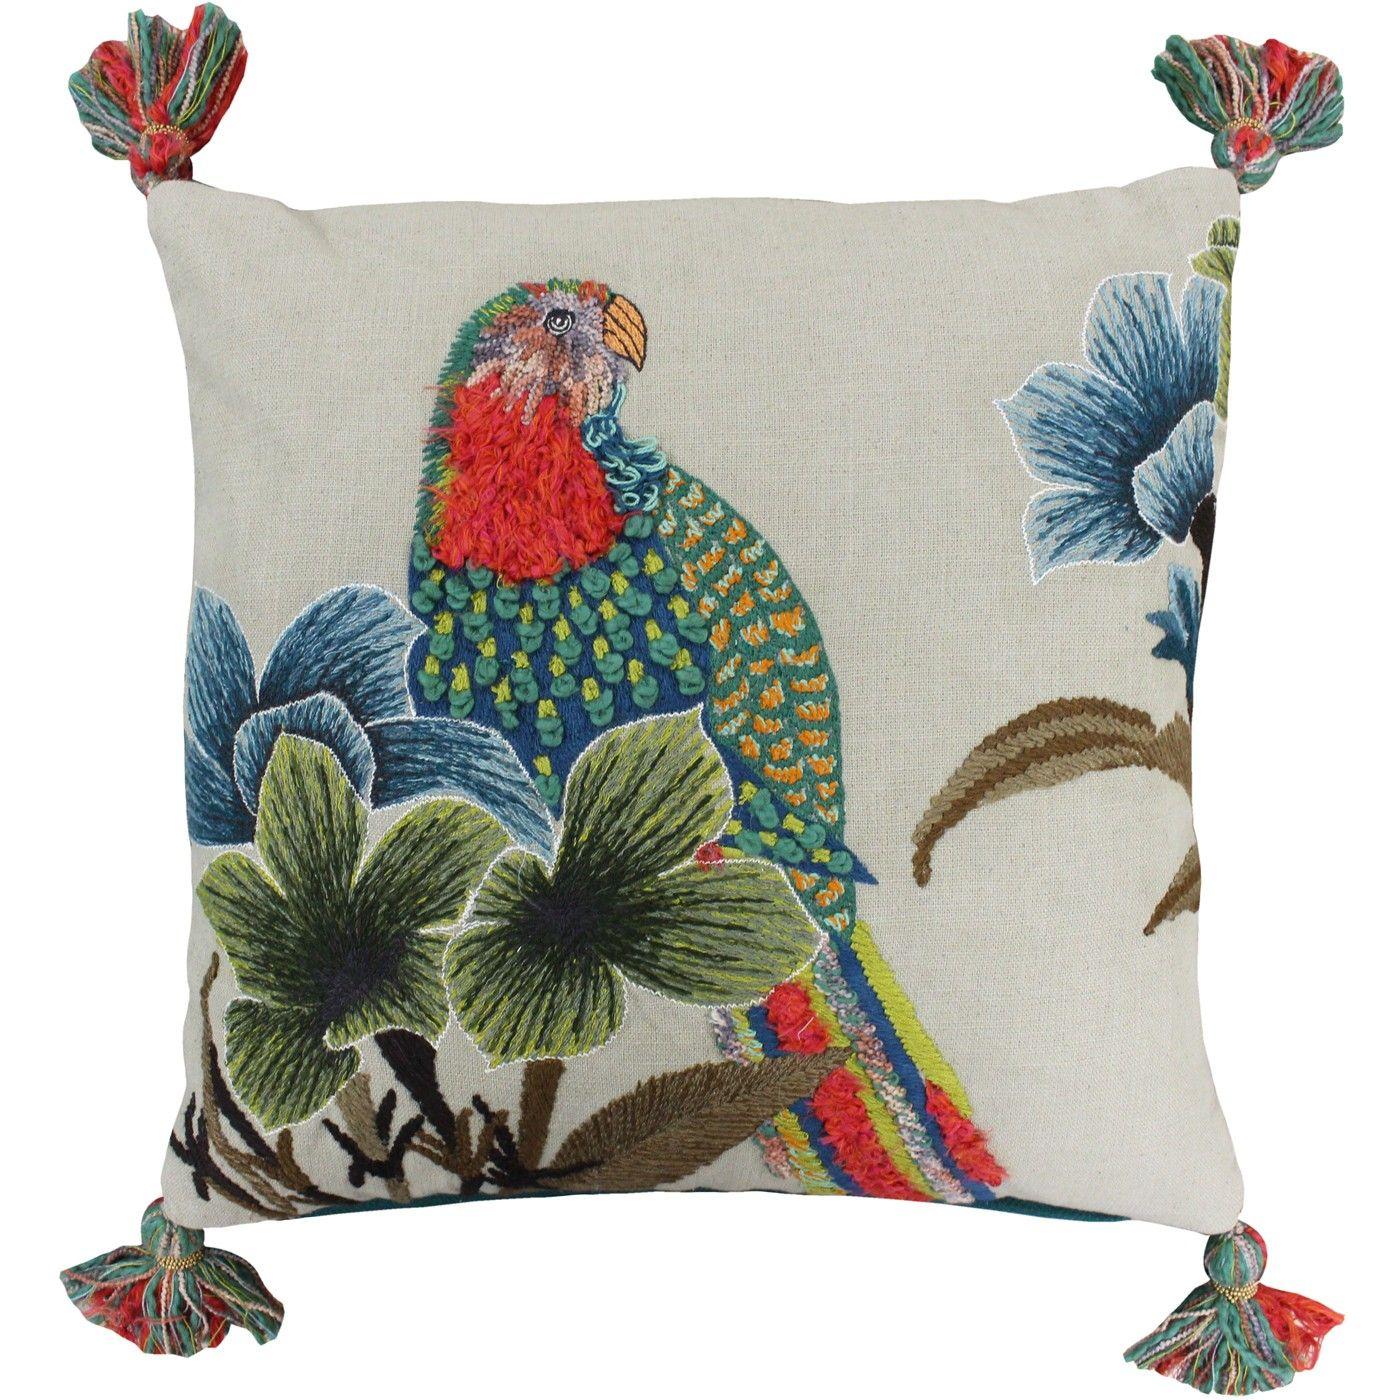 Surya Skyline I Decorative Throw Pillow | Throw pillows